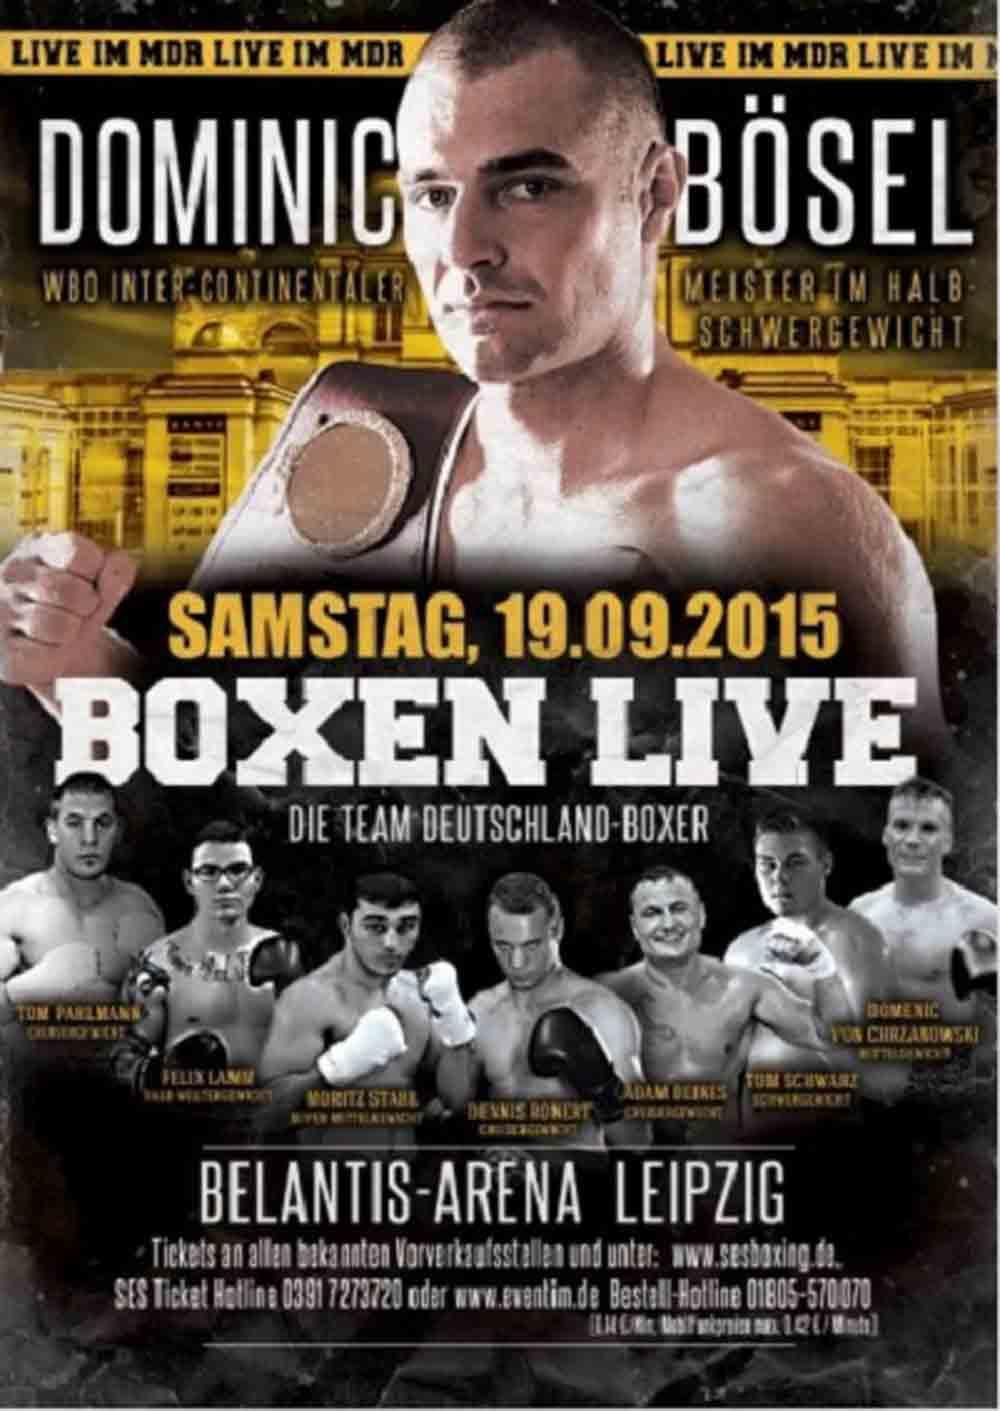 Boxen Live in Belantis